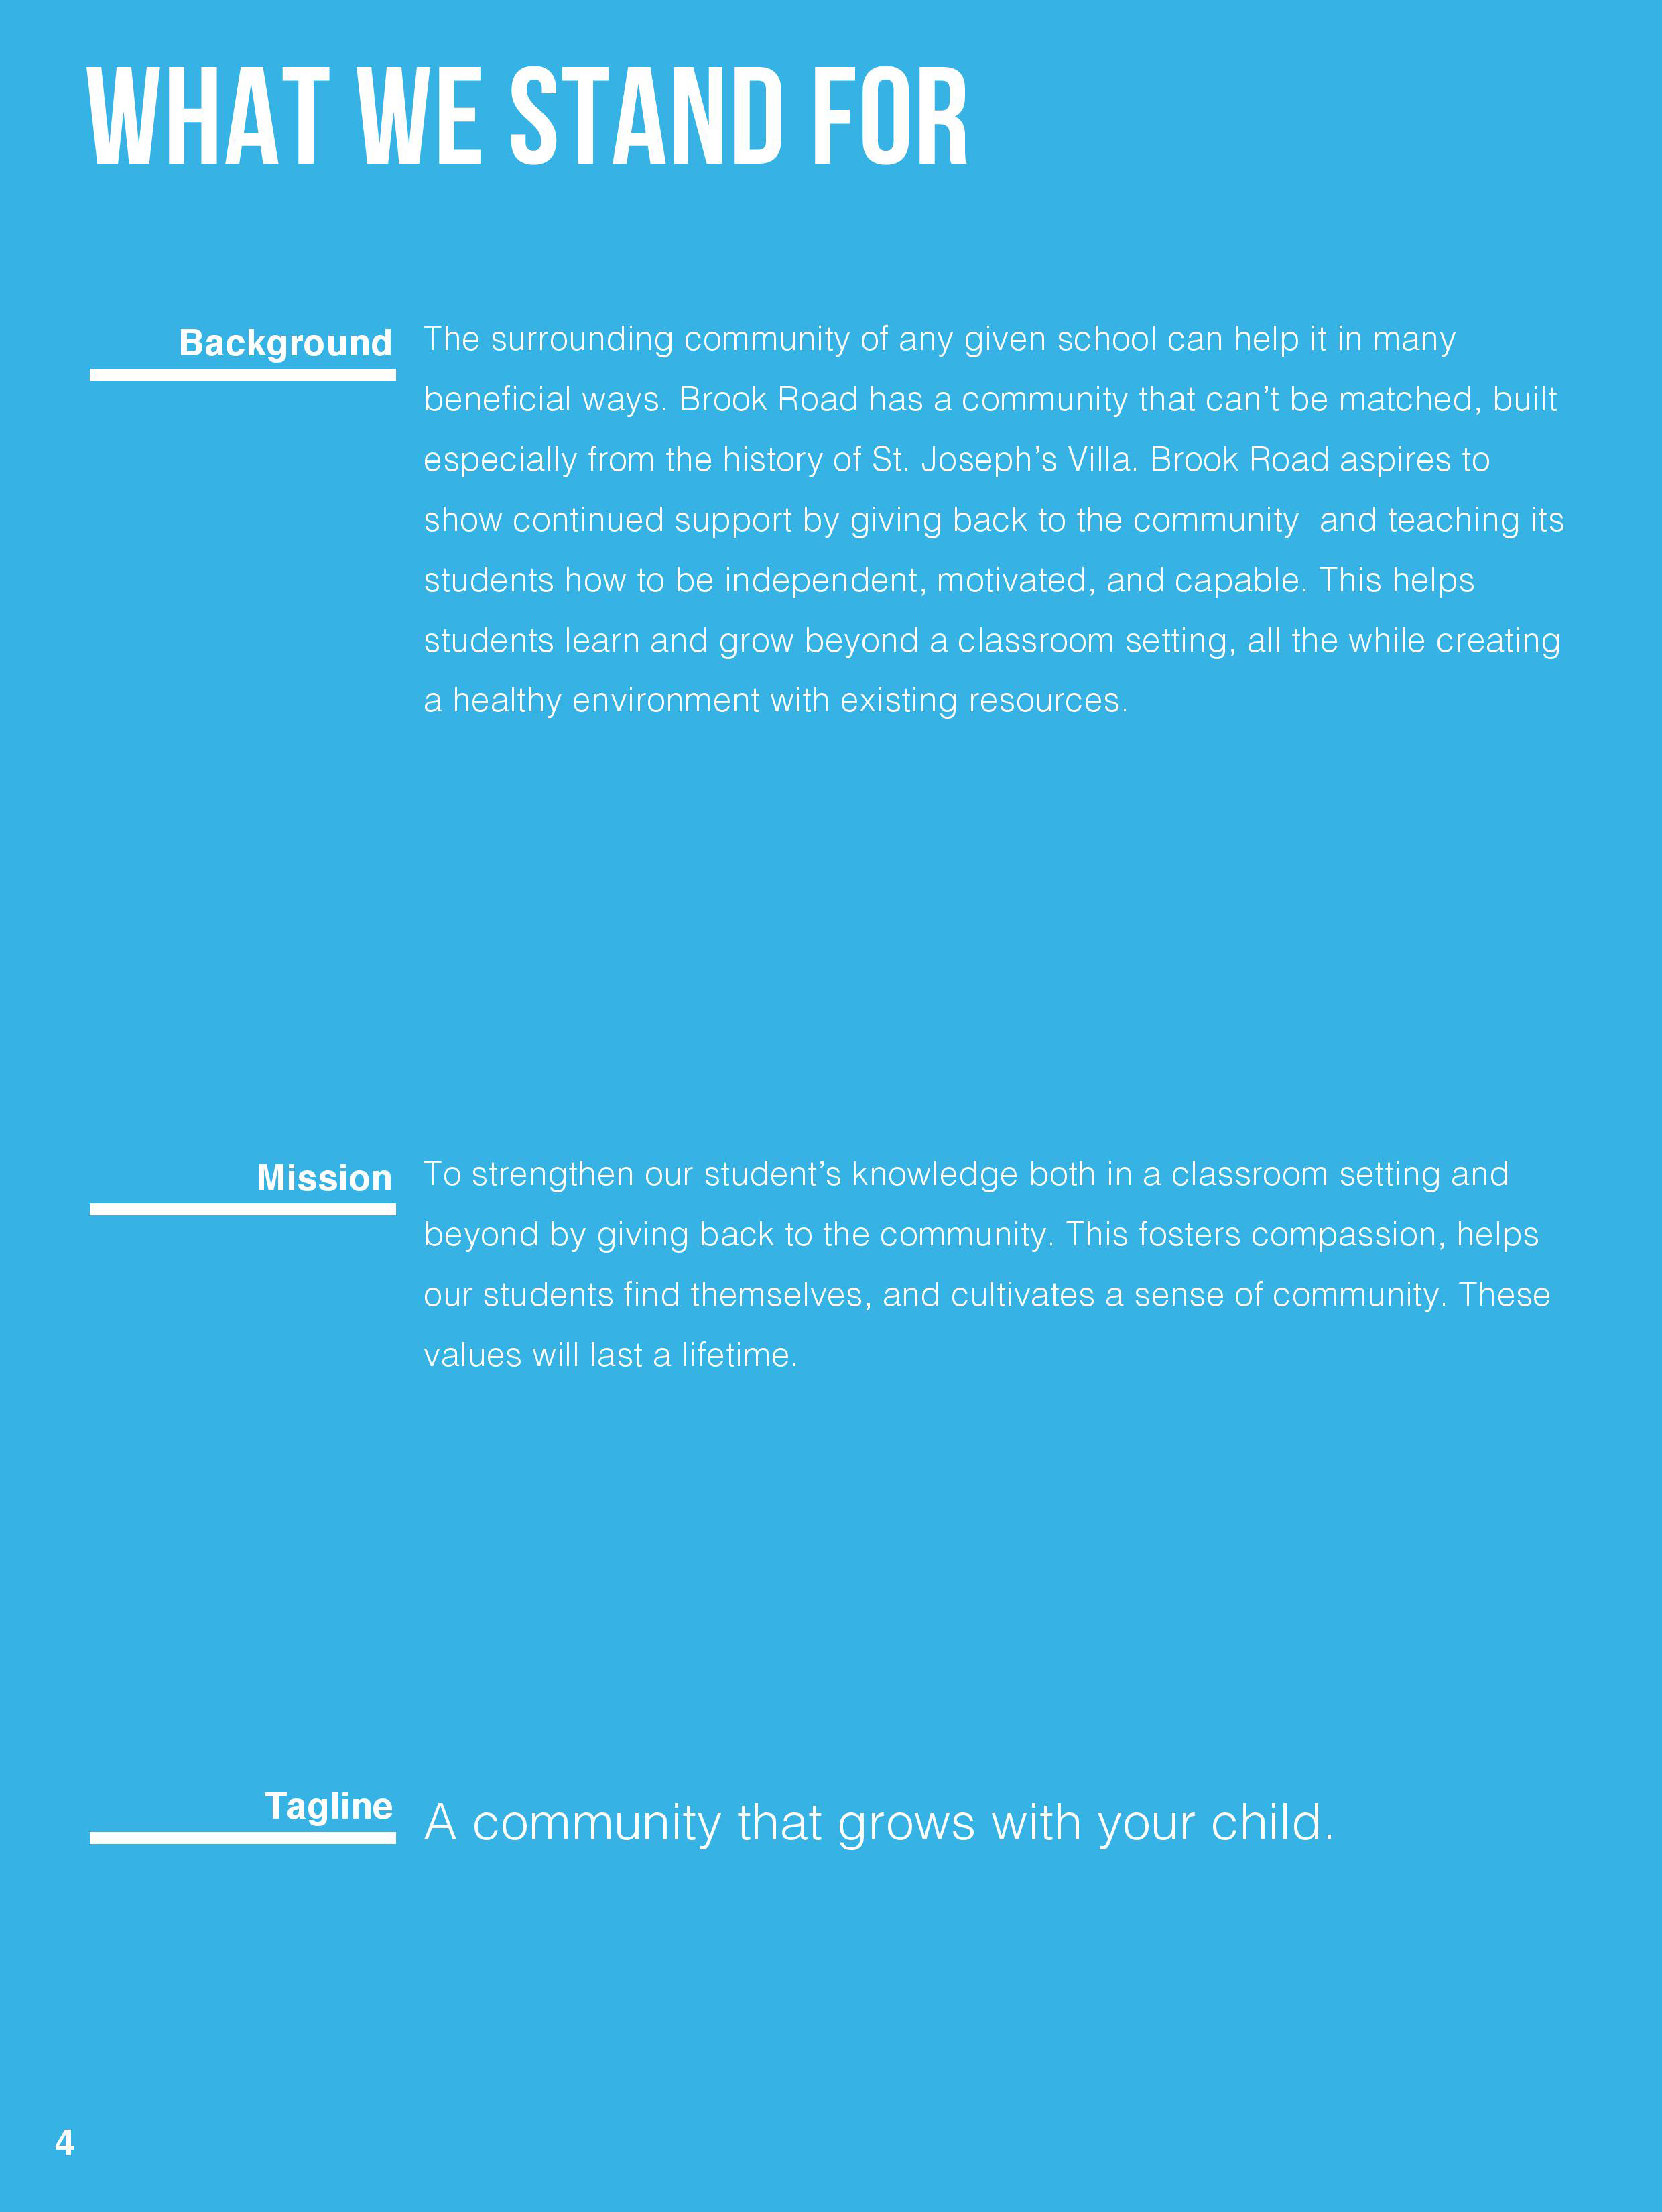 BrookRoad_Guideline-page-002.jpg